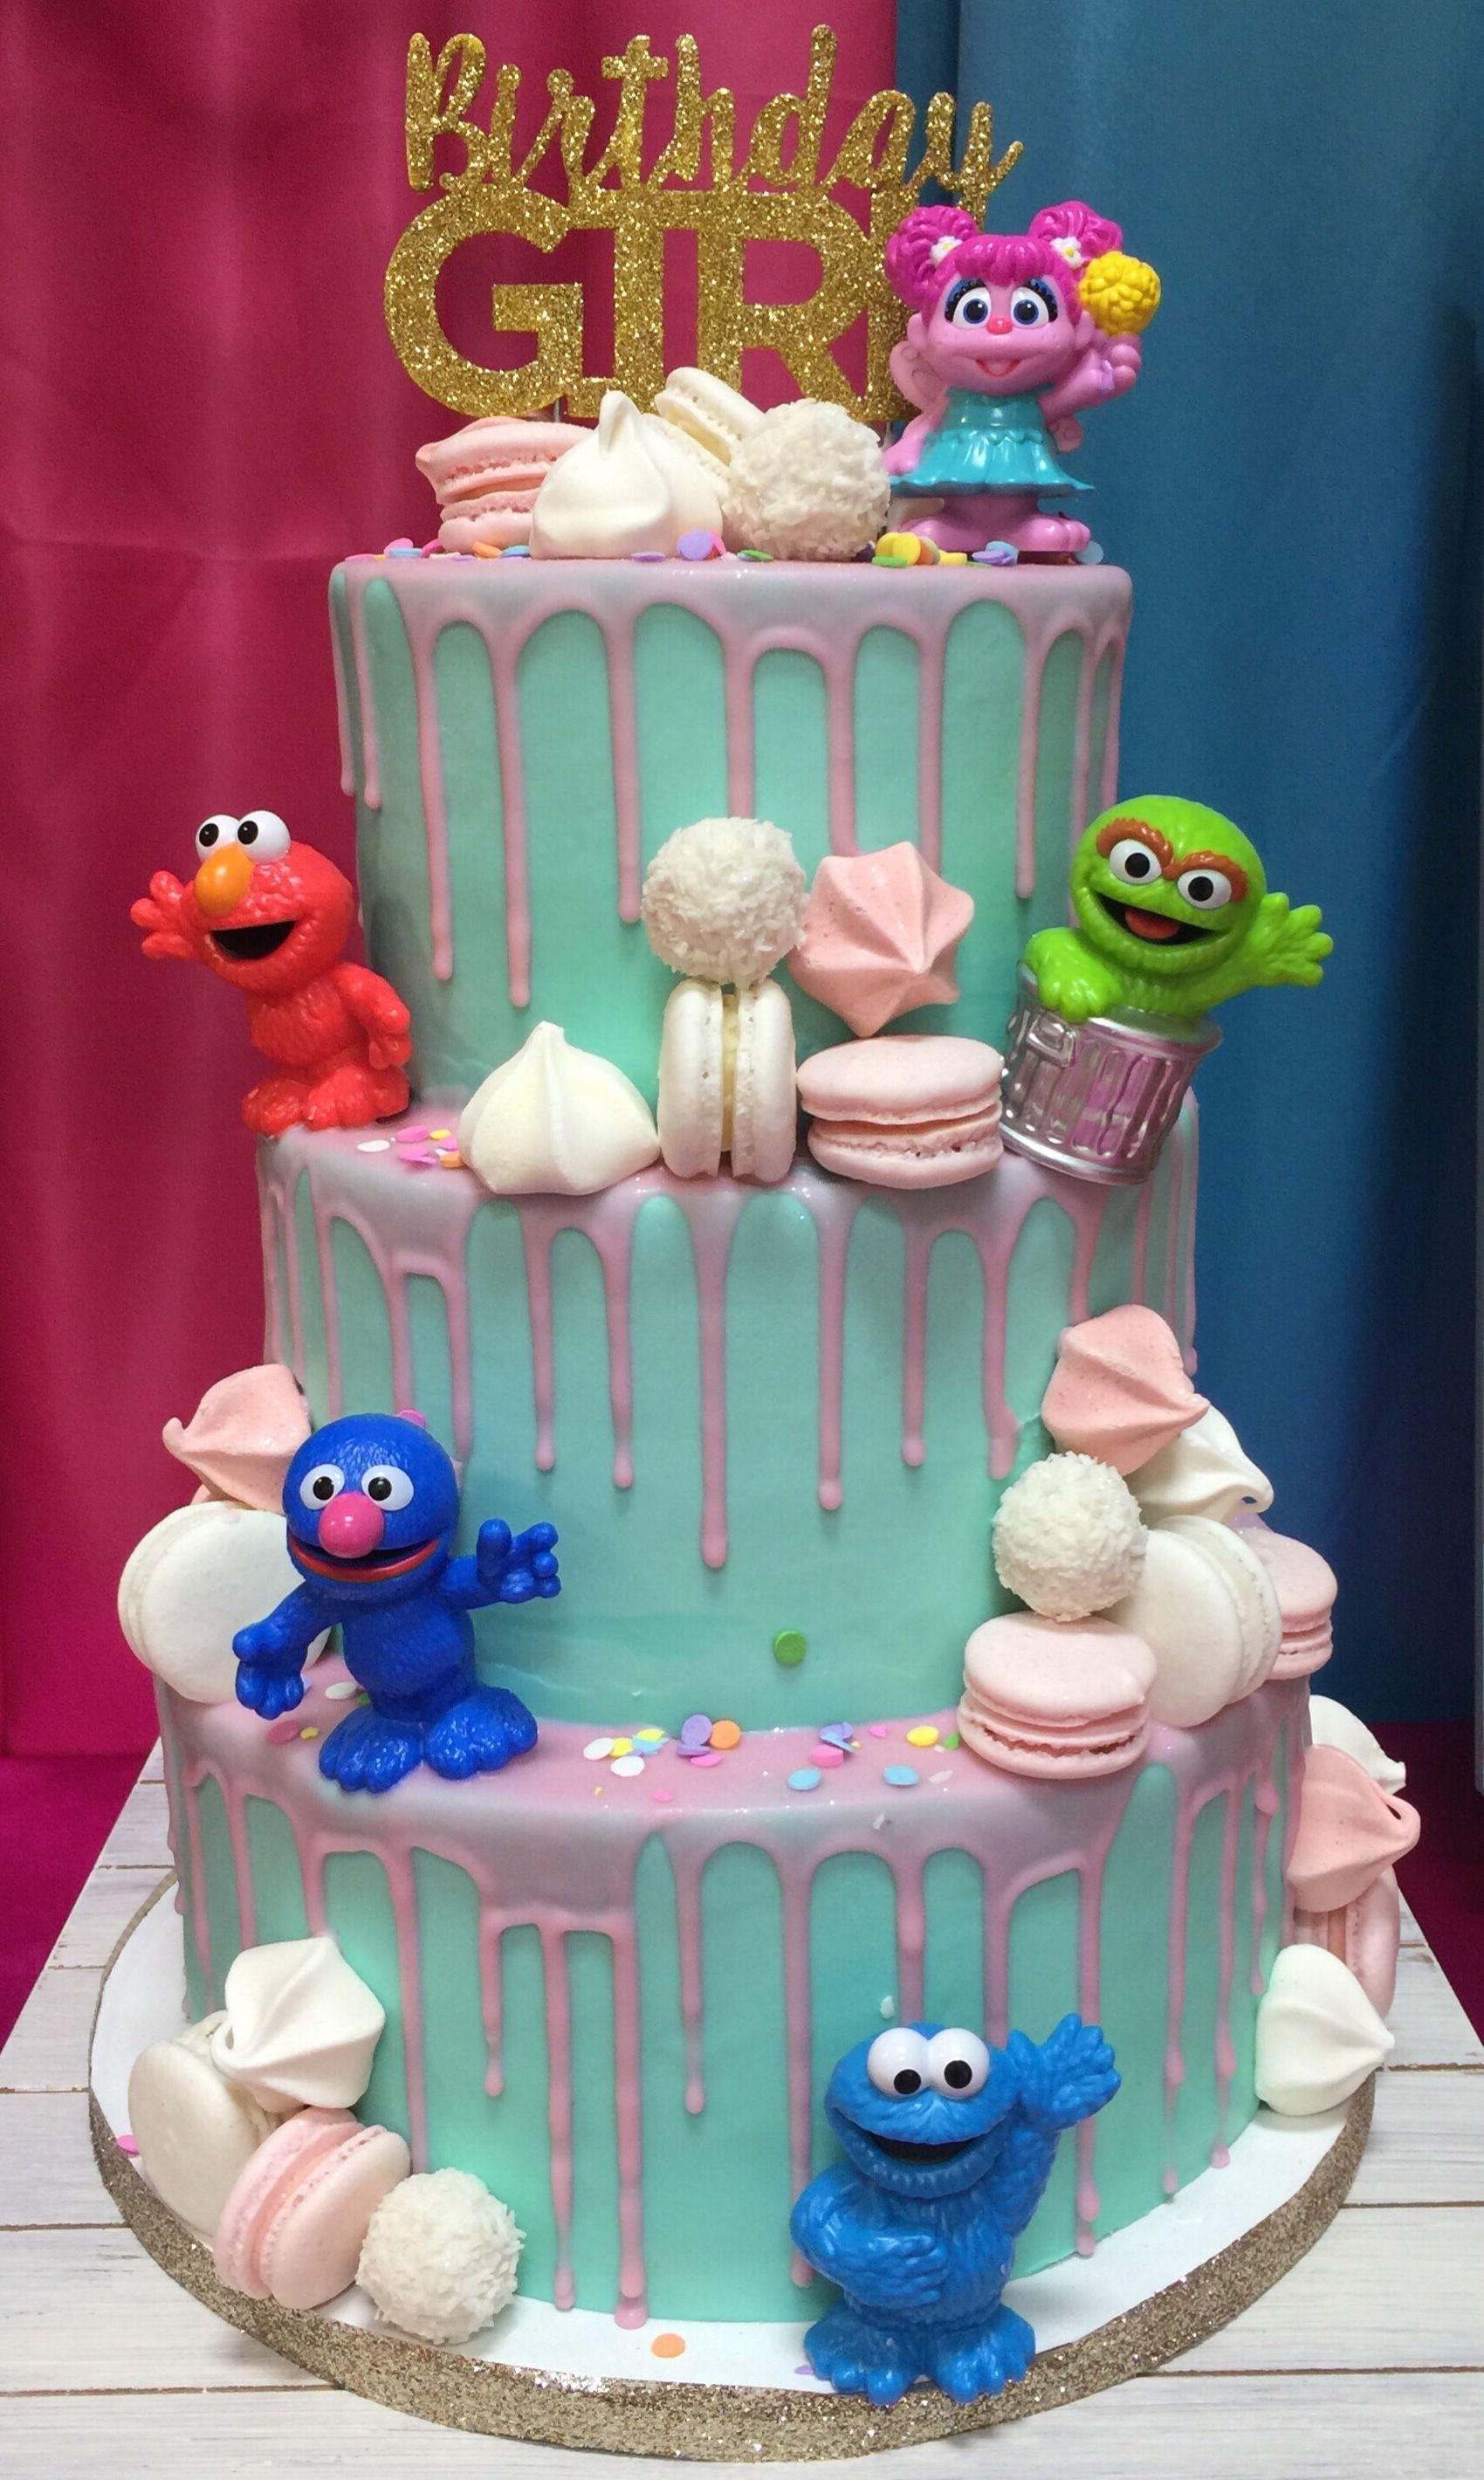 Girly Sesame Street Birthday Cake With Images Sesame Street